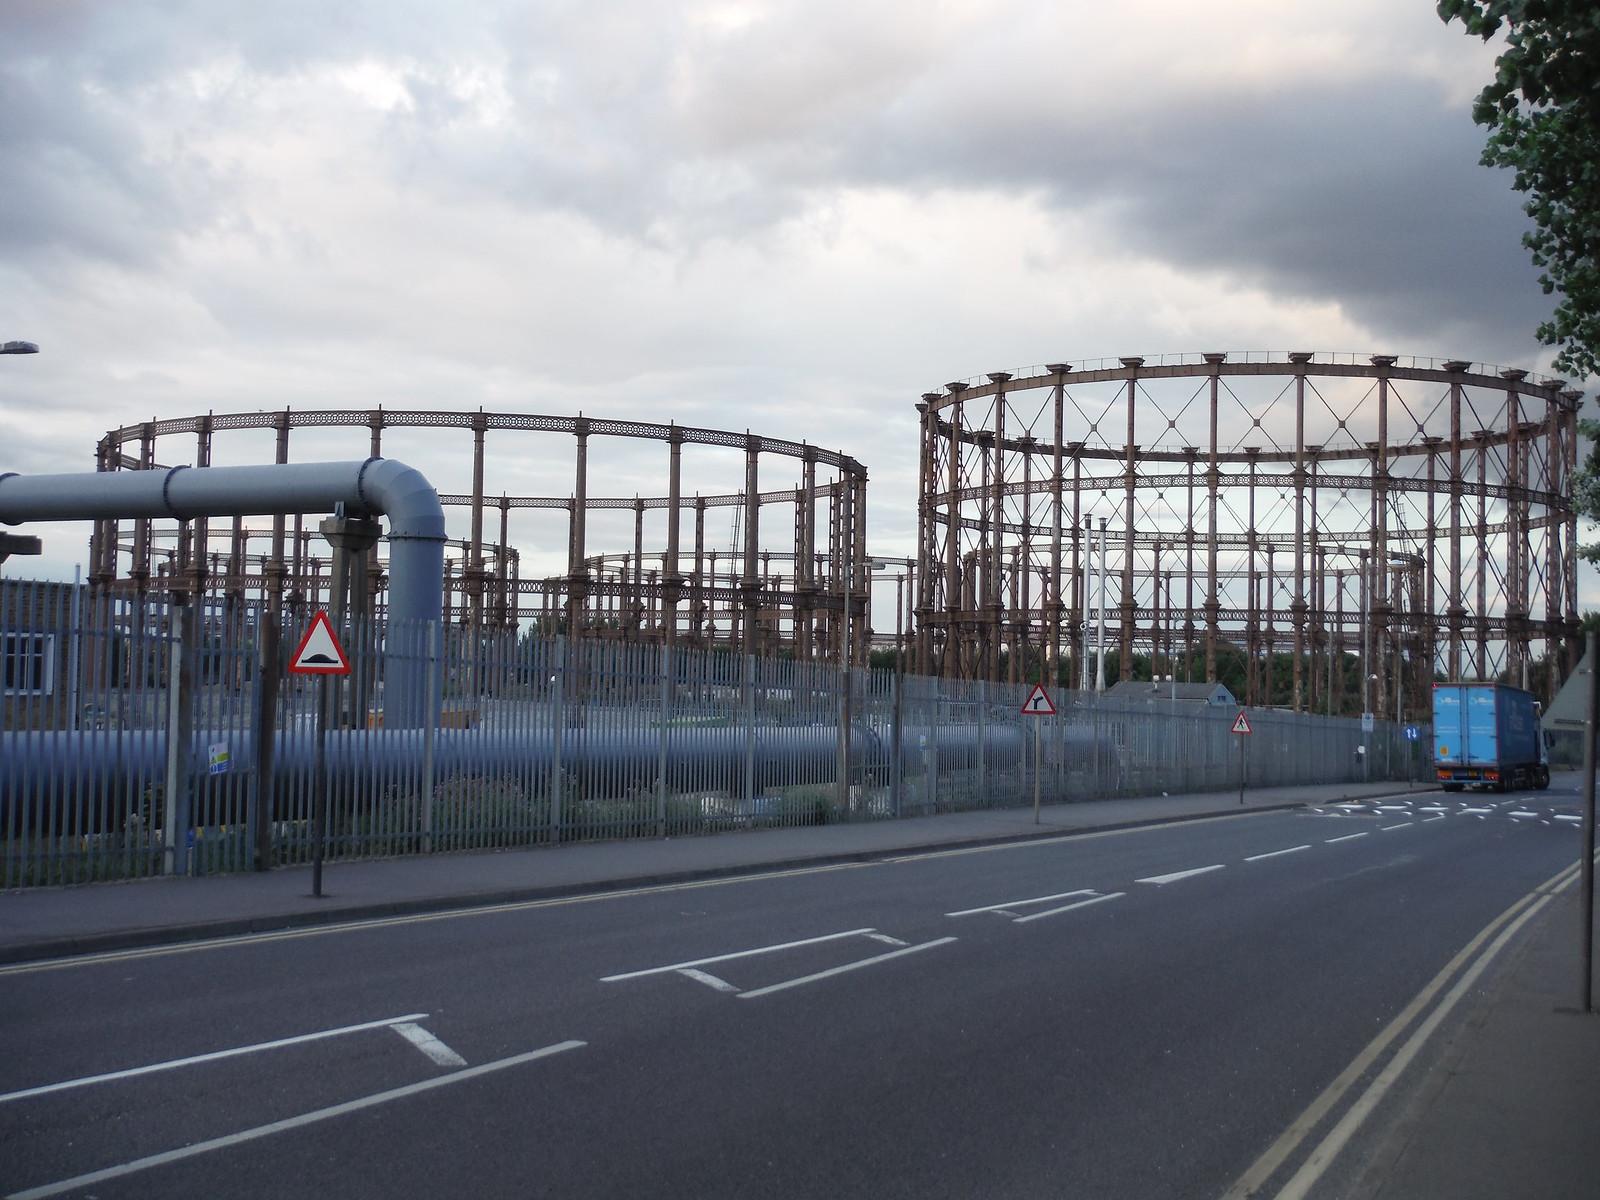 Disused Gasworks SWC Short Walk 21 - The Line Modern Art Walk (Stratford to North Greenwich)